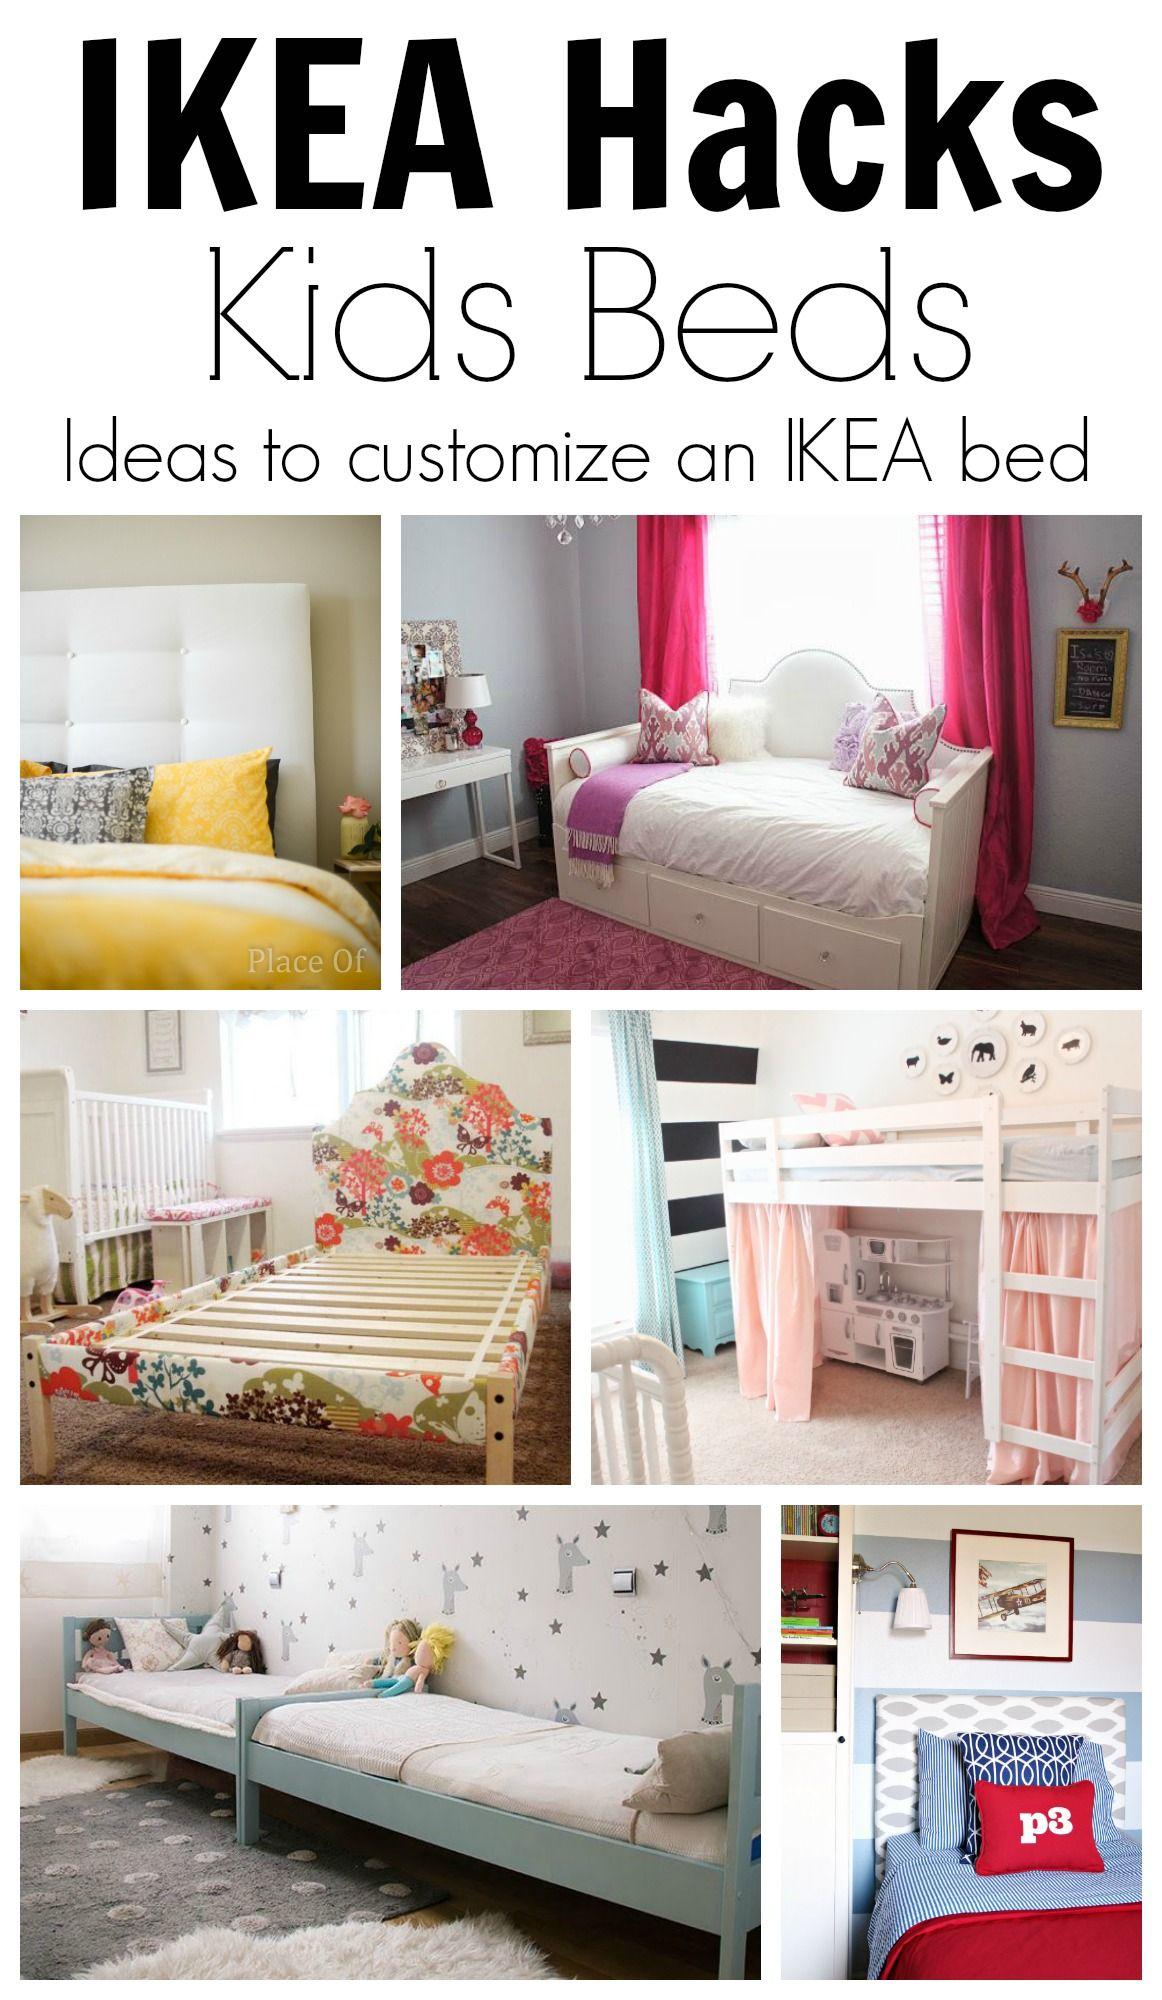 Ikea Hack Ideas To Customize Kids Beds Teen Girl Room